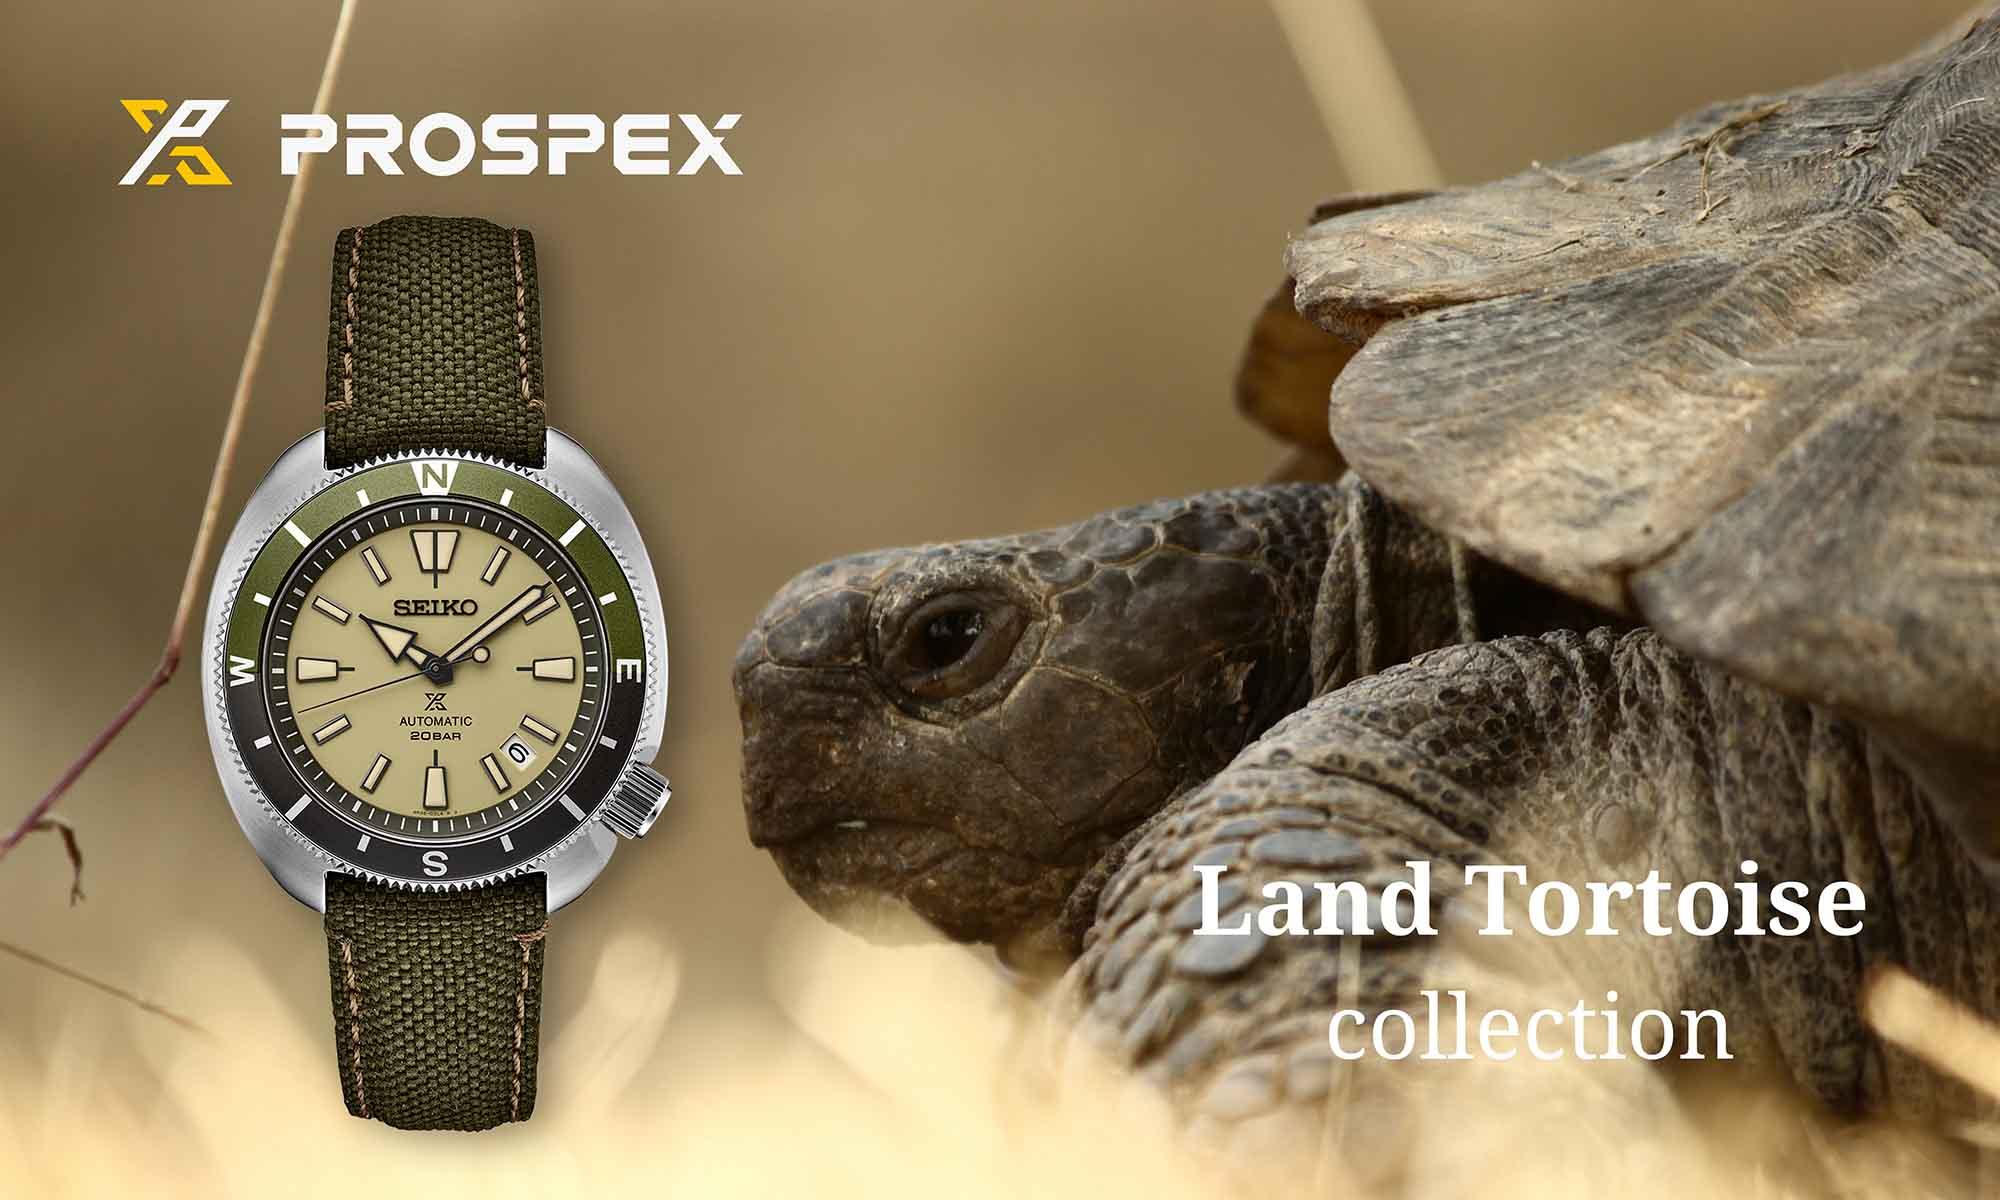 Prospex Land Tortoise